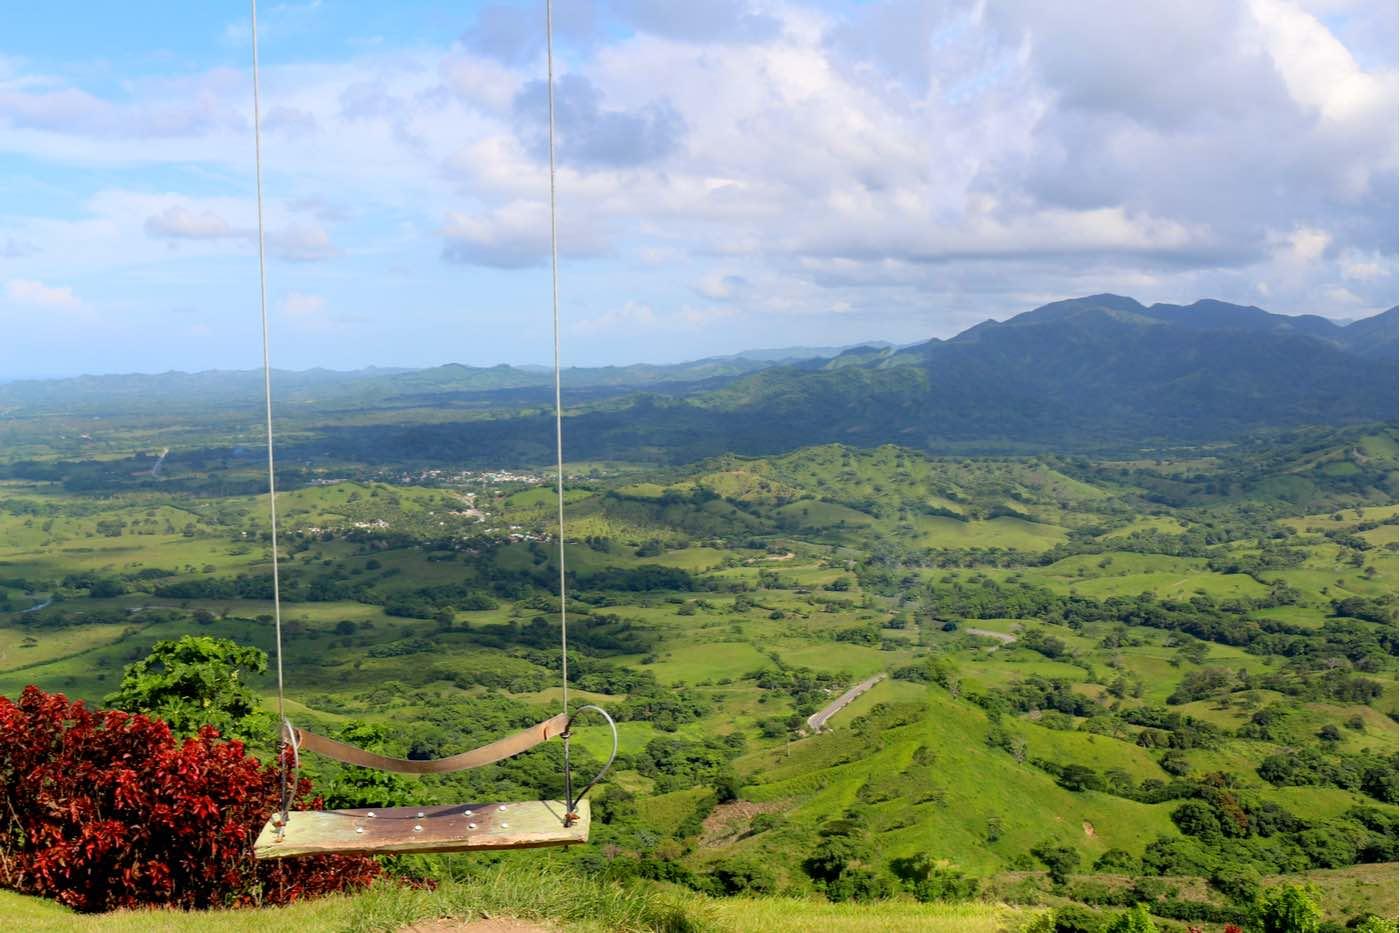 El famoso columpio de montaña Redonda en Miches, República Dominicana.